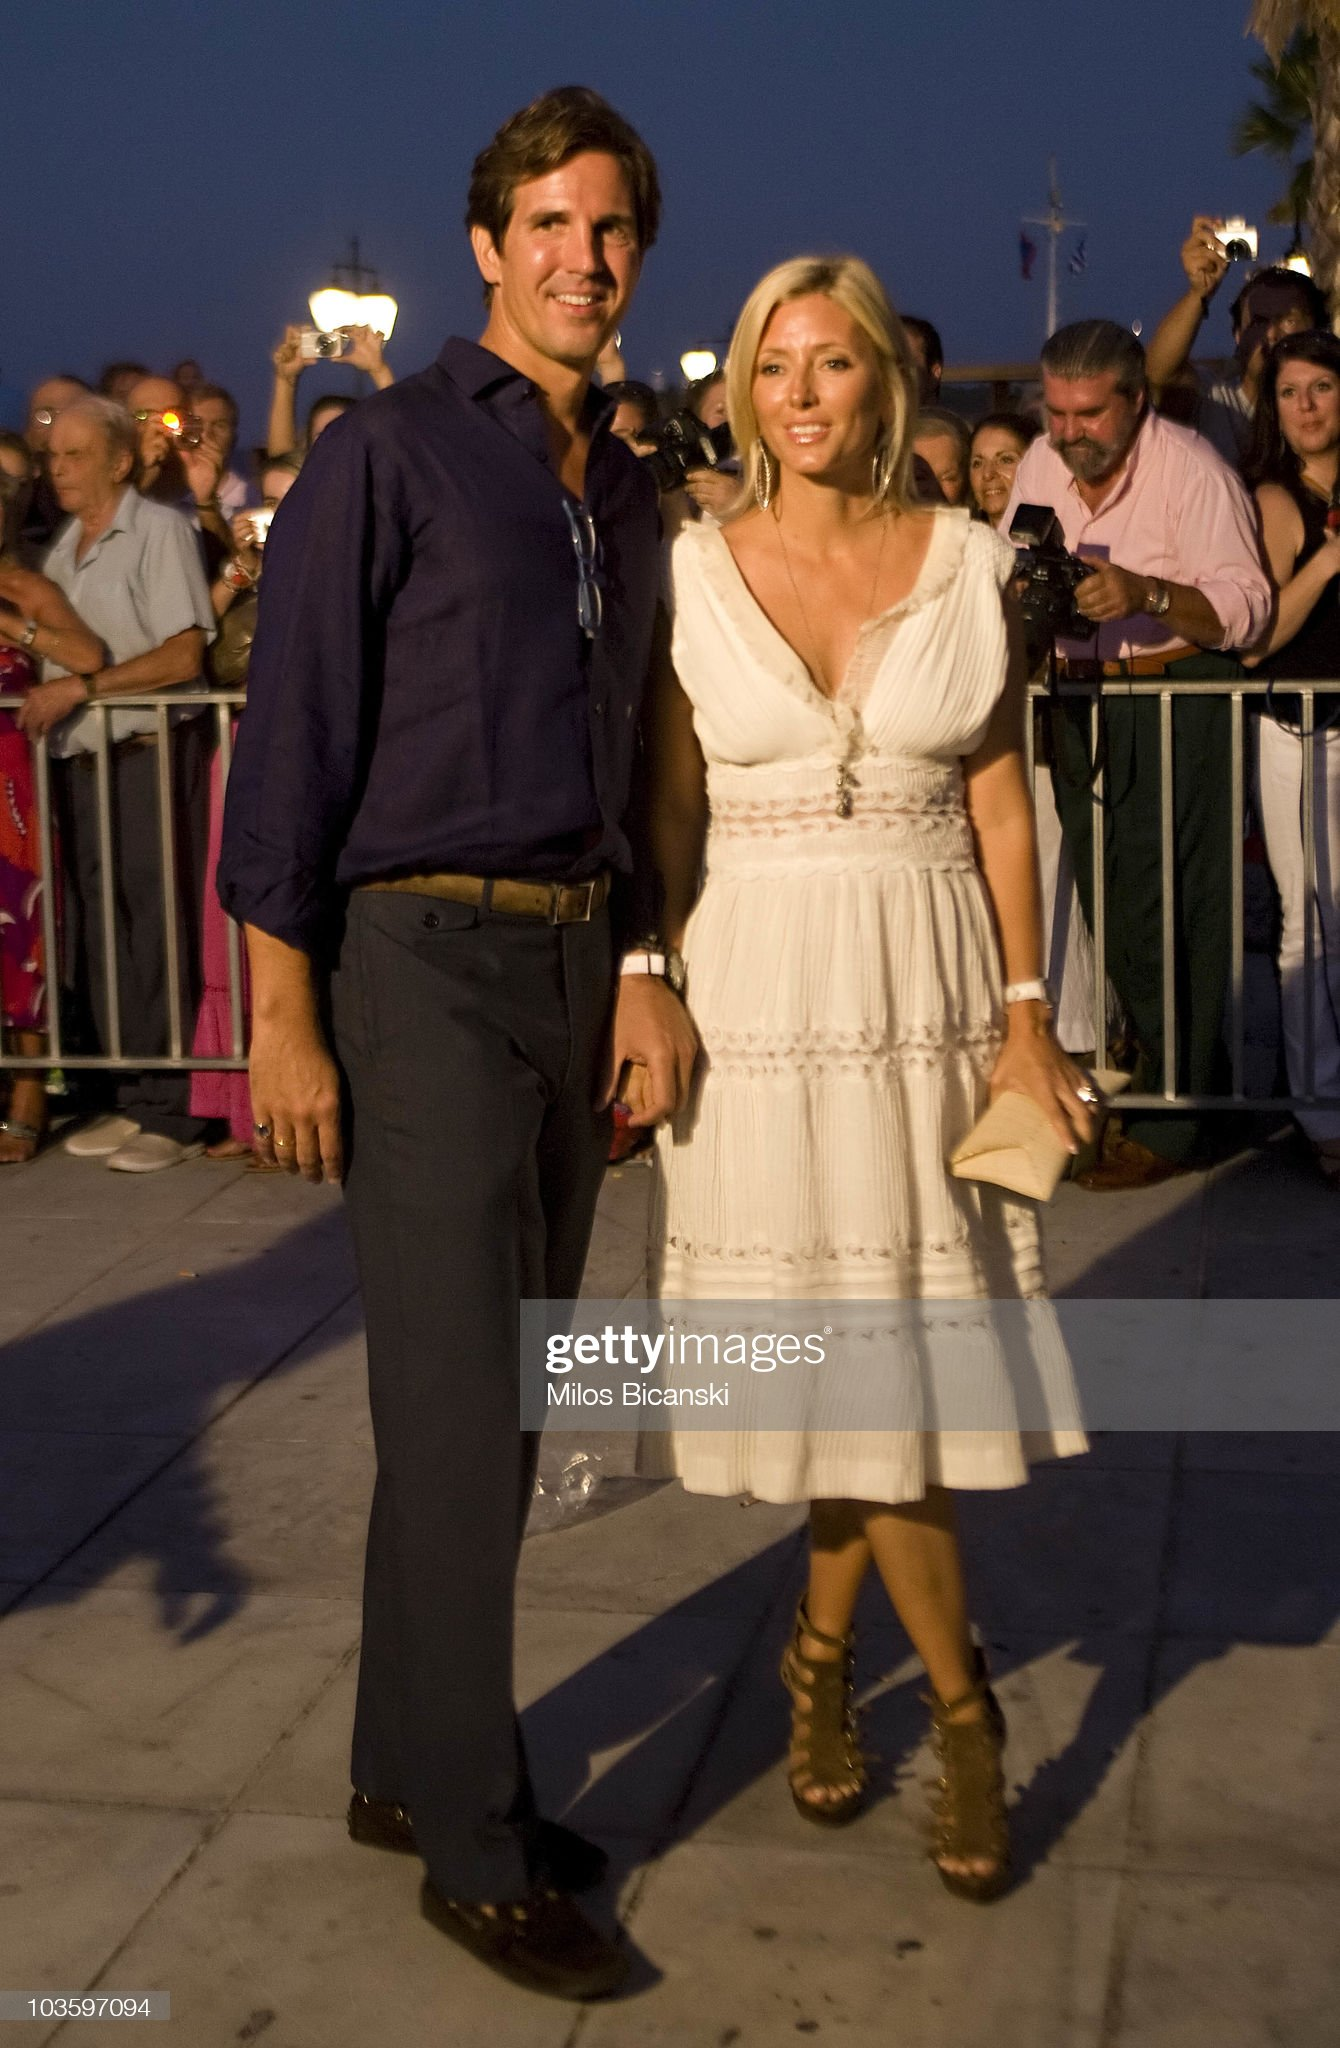 Wedding of Prince Nikolaos and Tatiana Blatnik - Pre Wedding Reception : News Photo